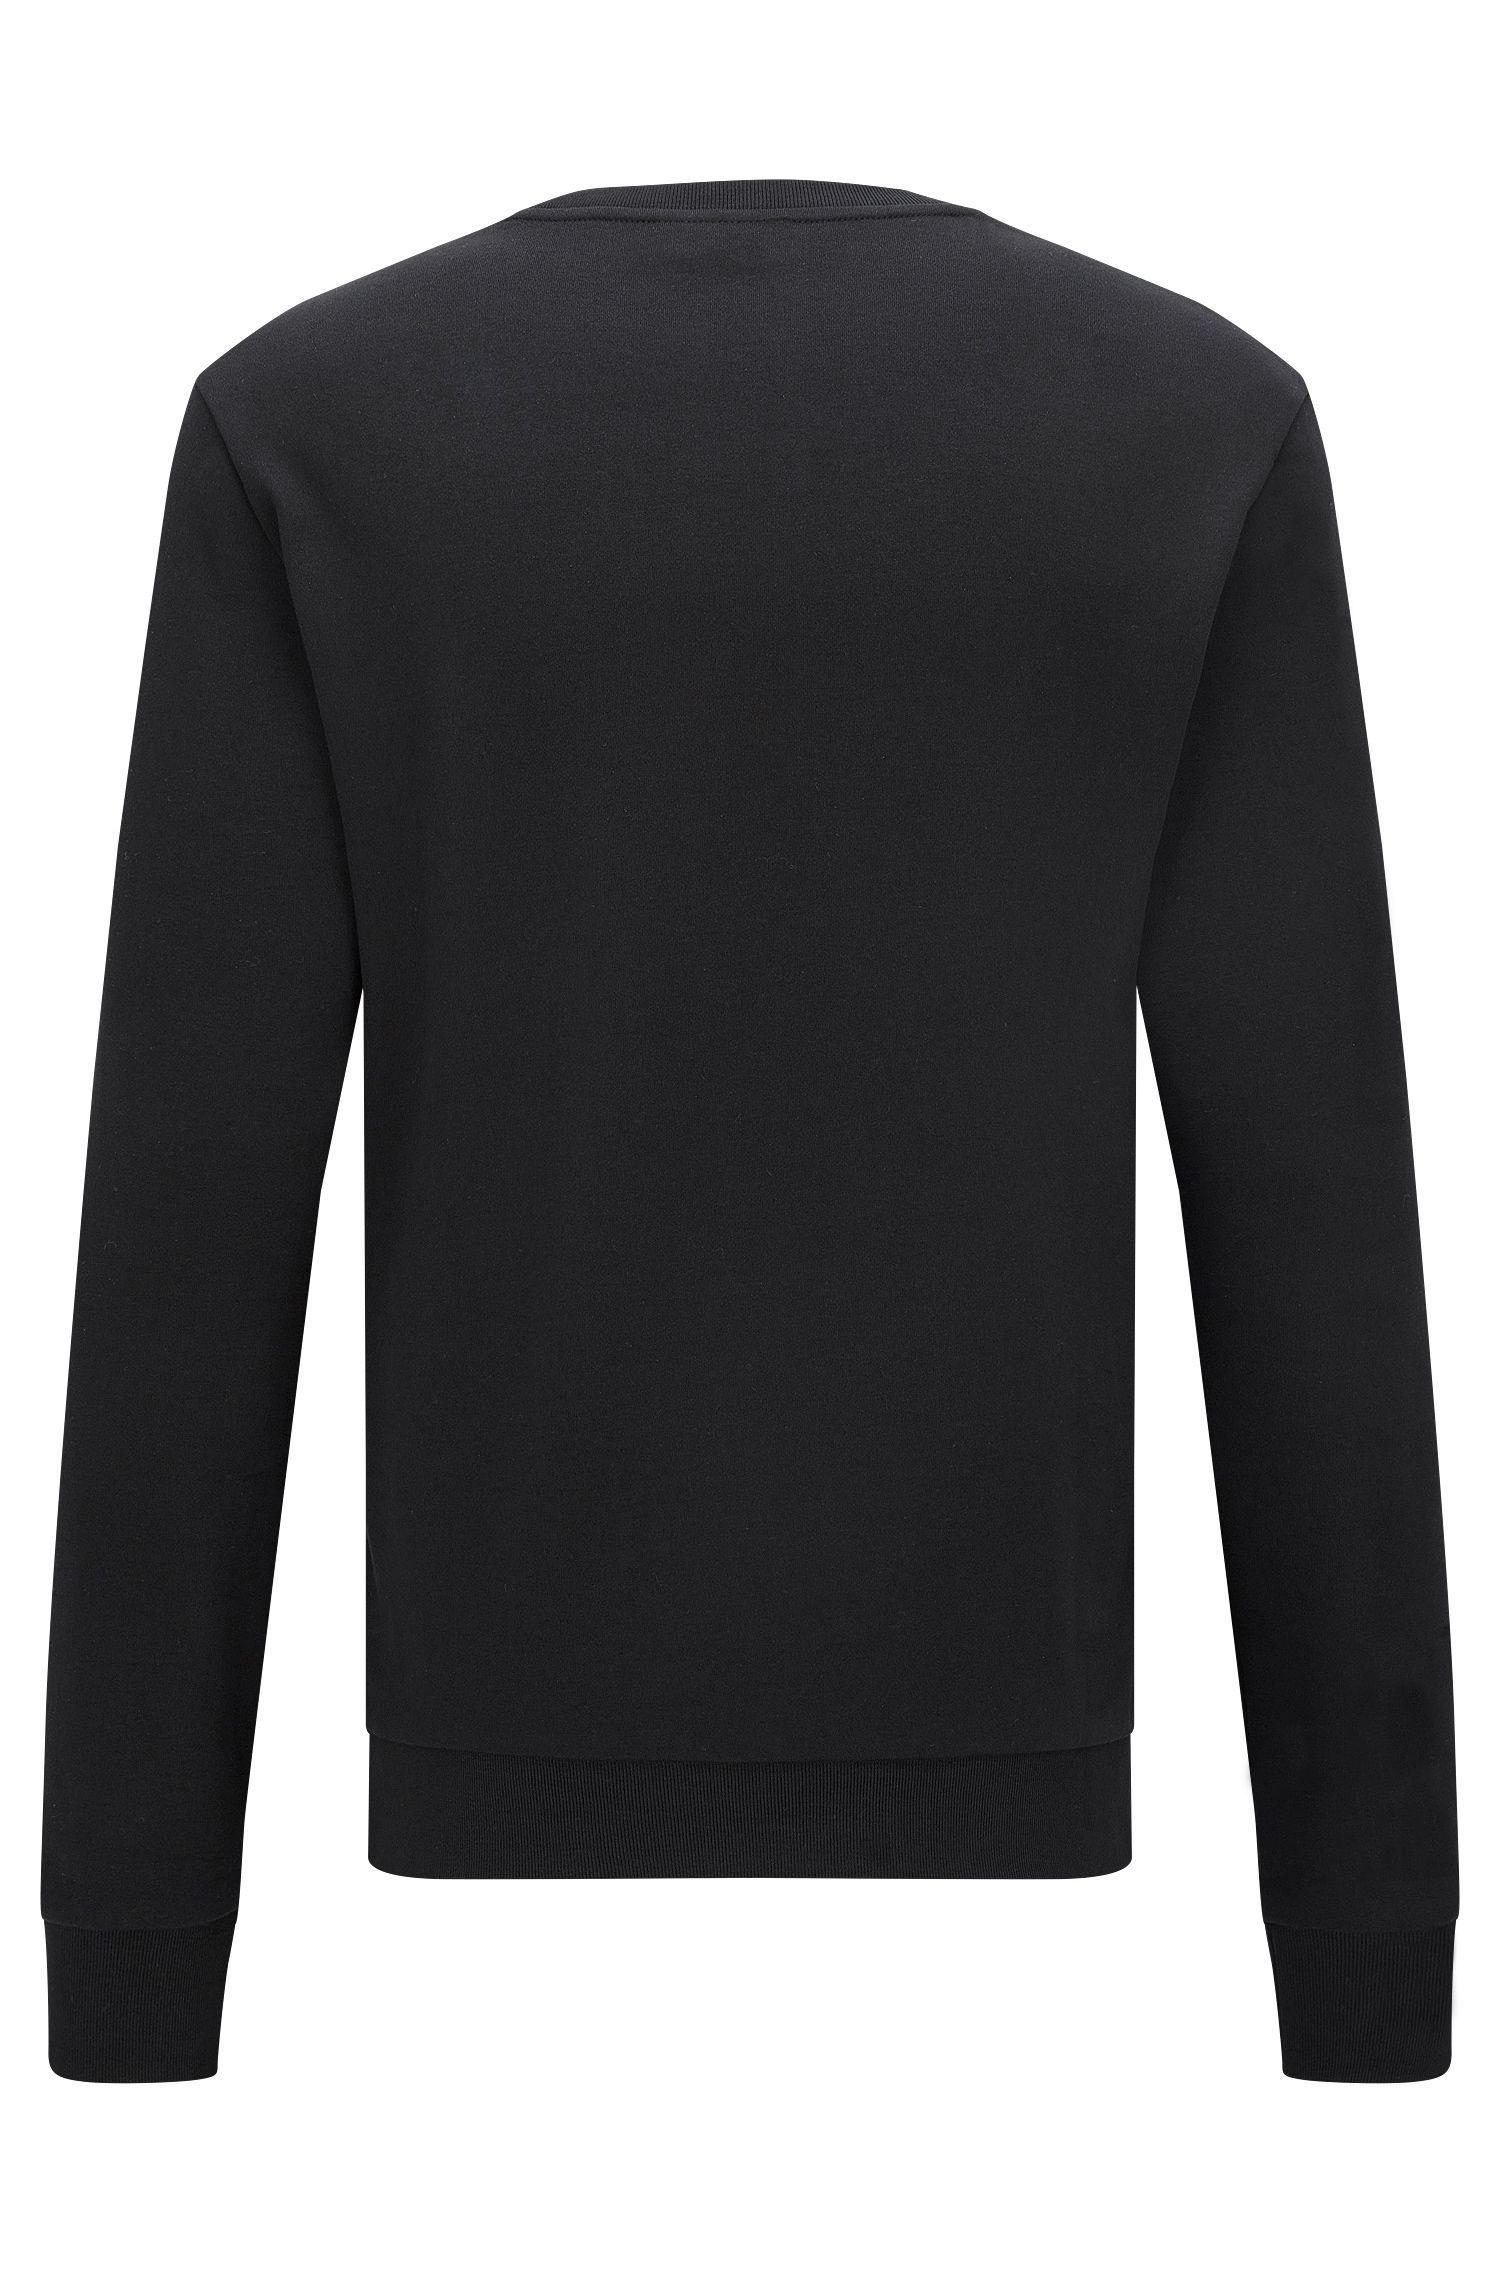 Rubber Print Sweatshirt | Dicagos